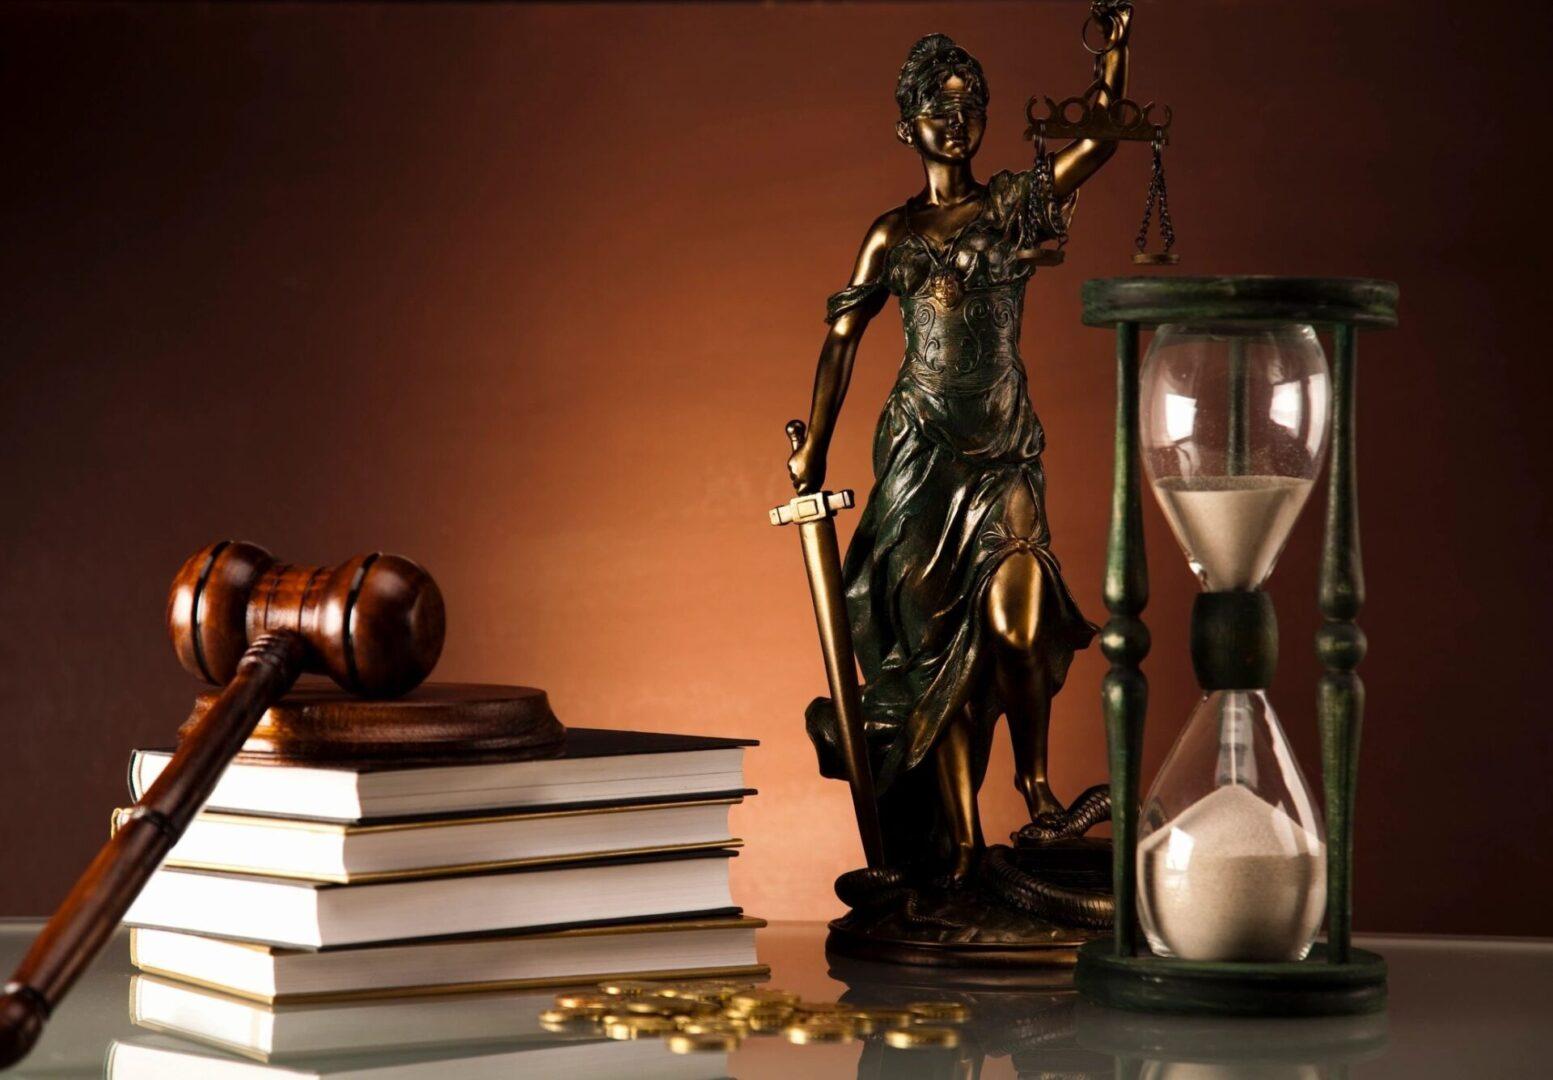 M. Kevin Bailey Law, PLLC